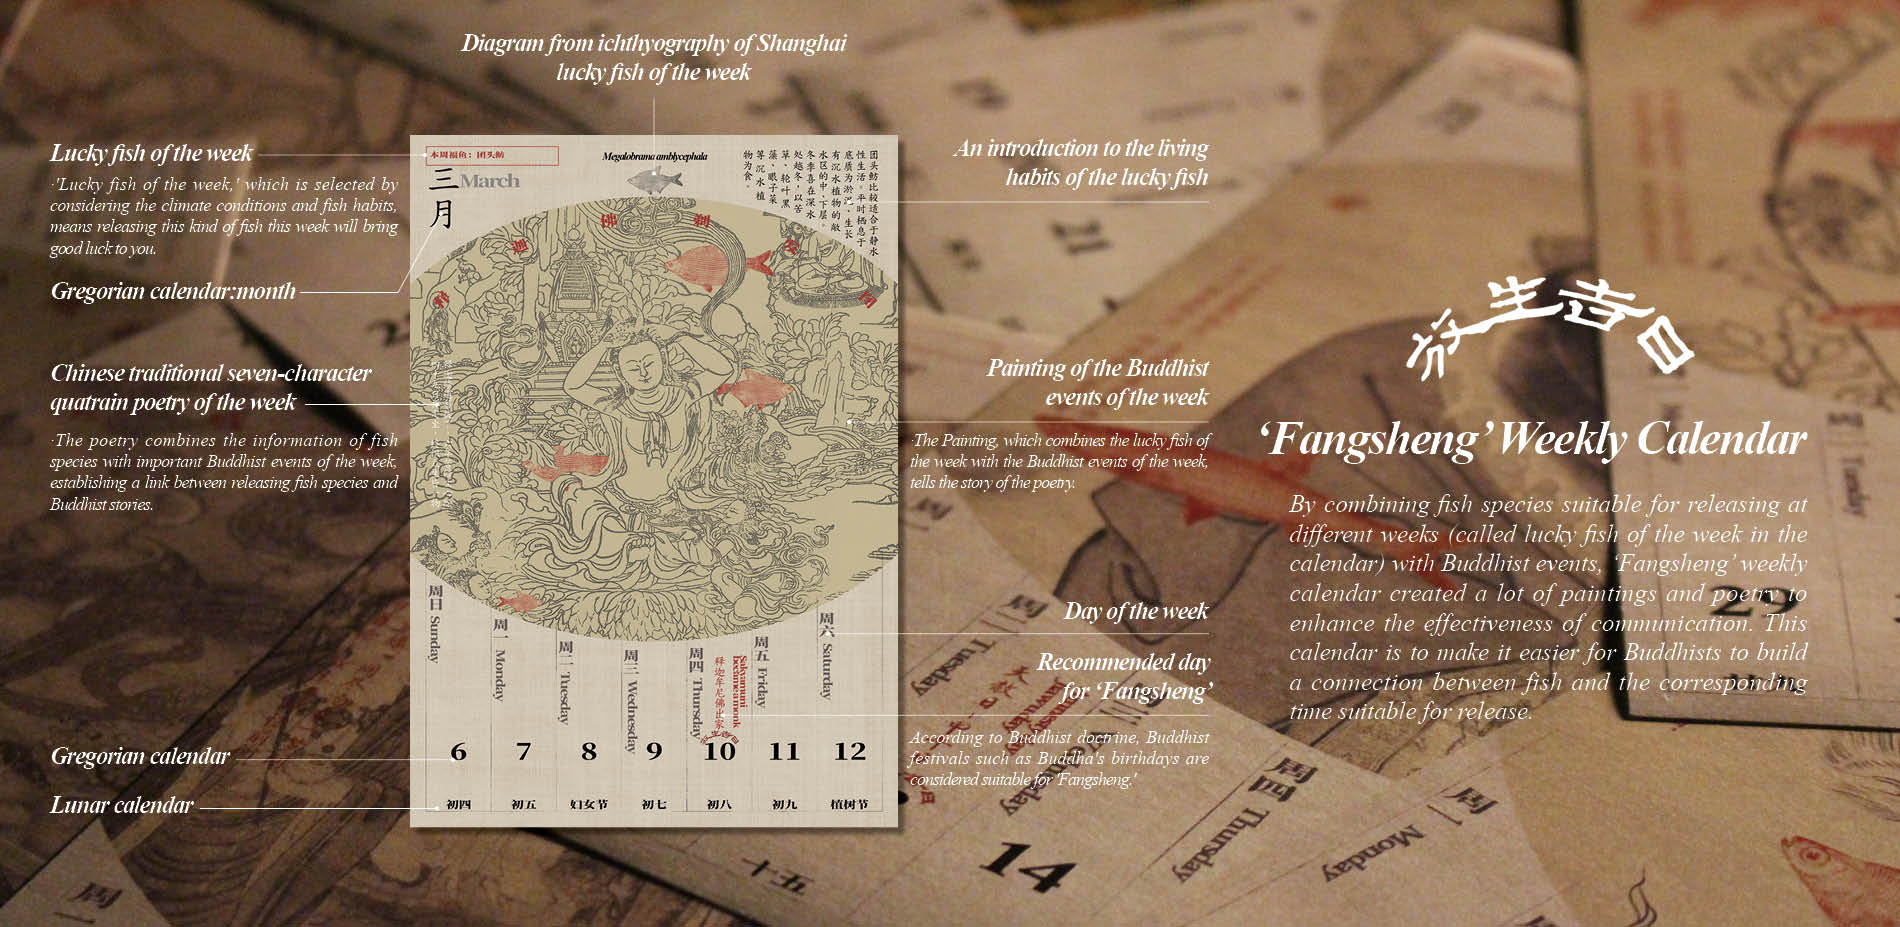 'Fangsheng' Weekly Calendar